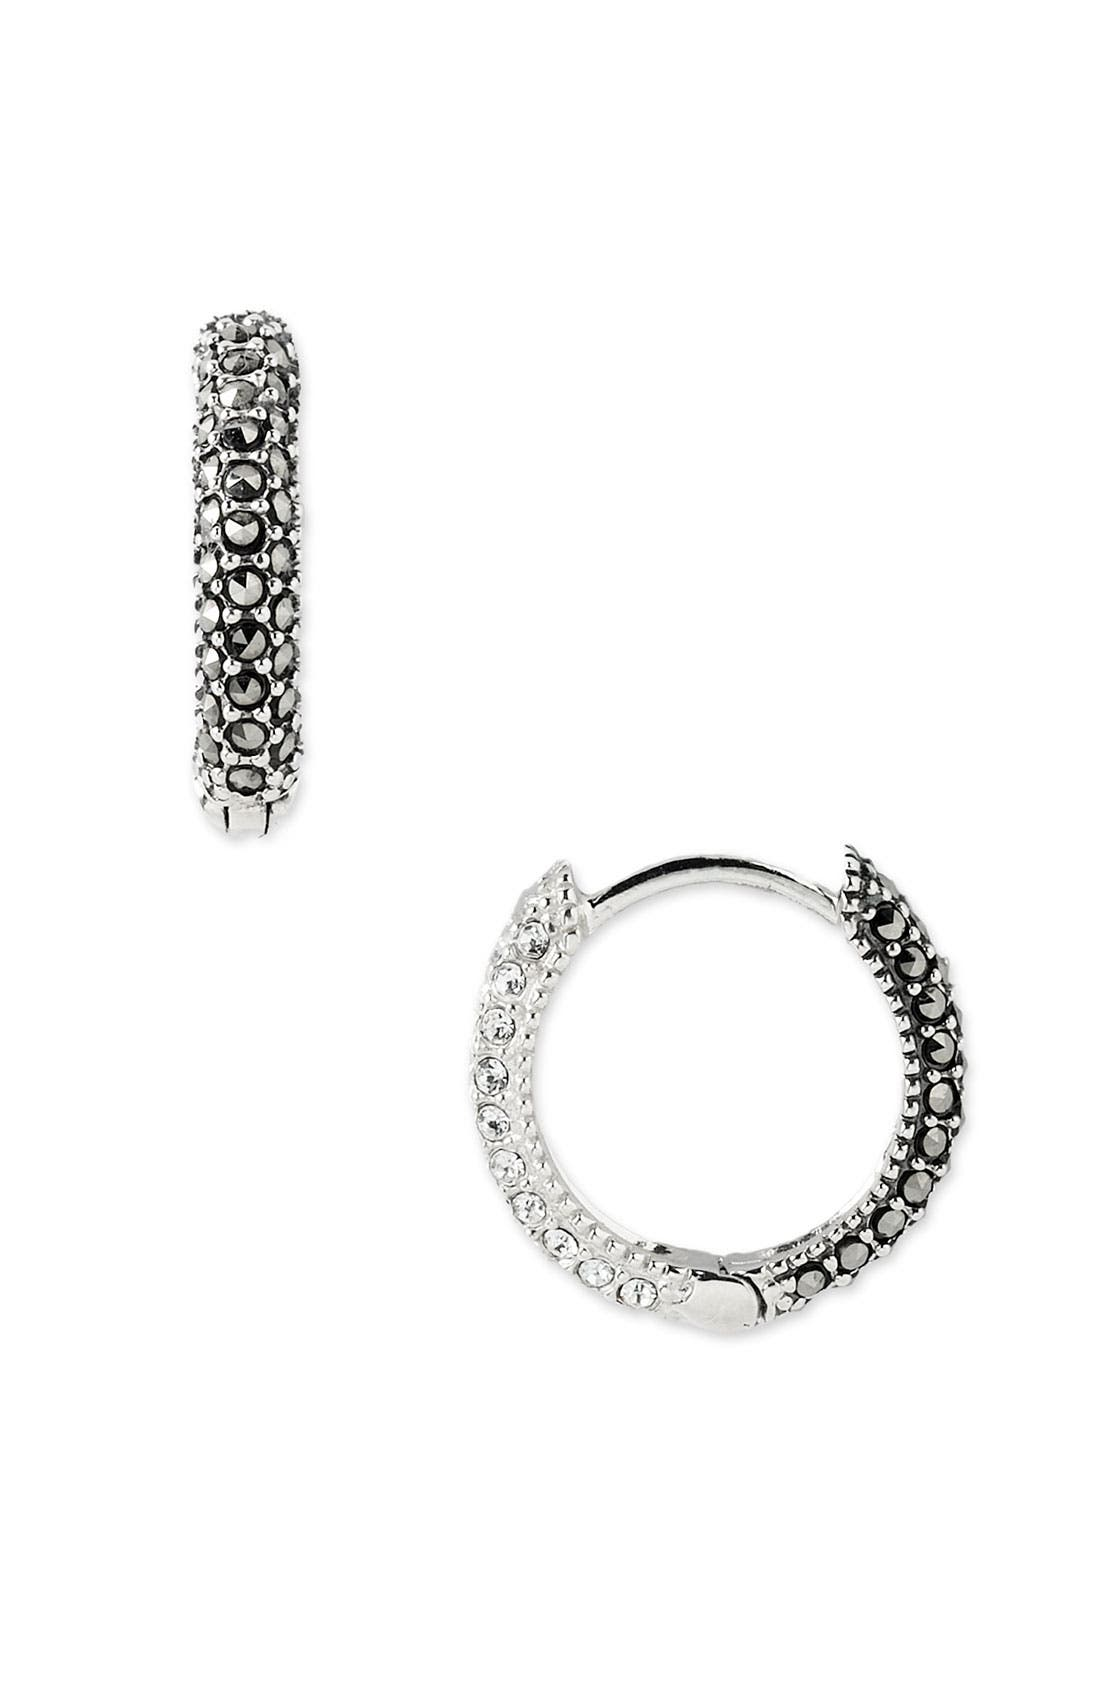 Reversible Hoop Earrings,                             Main thumbnail 1, color,                             040